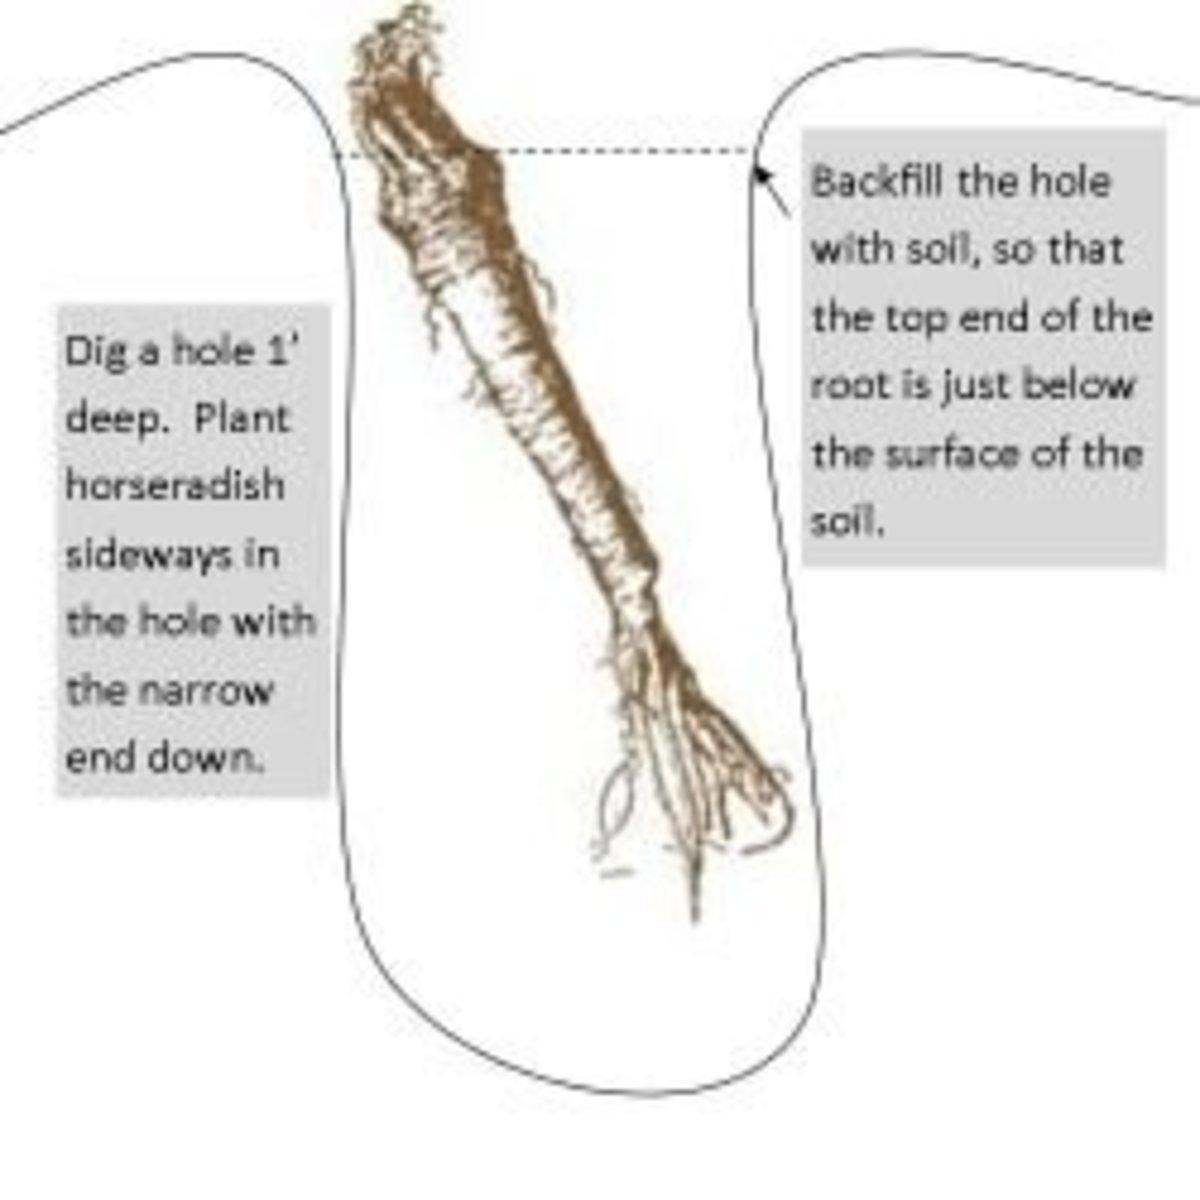 How to Plant Horseradish